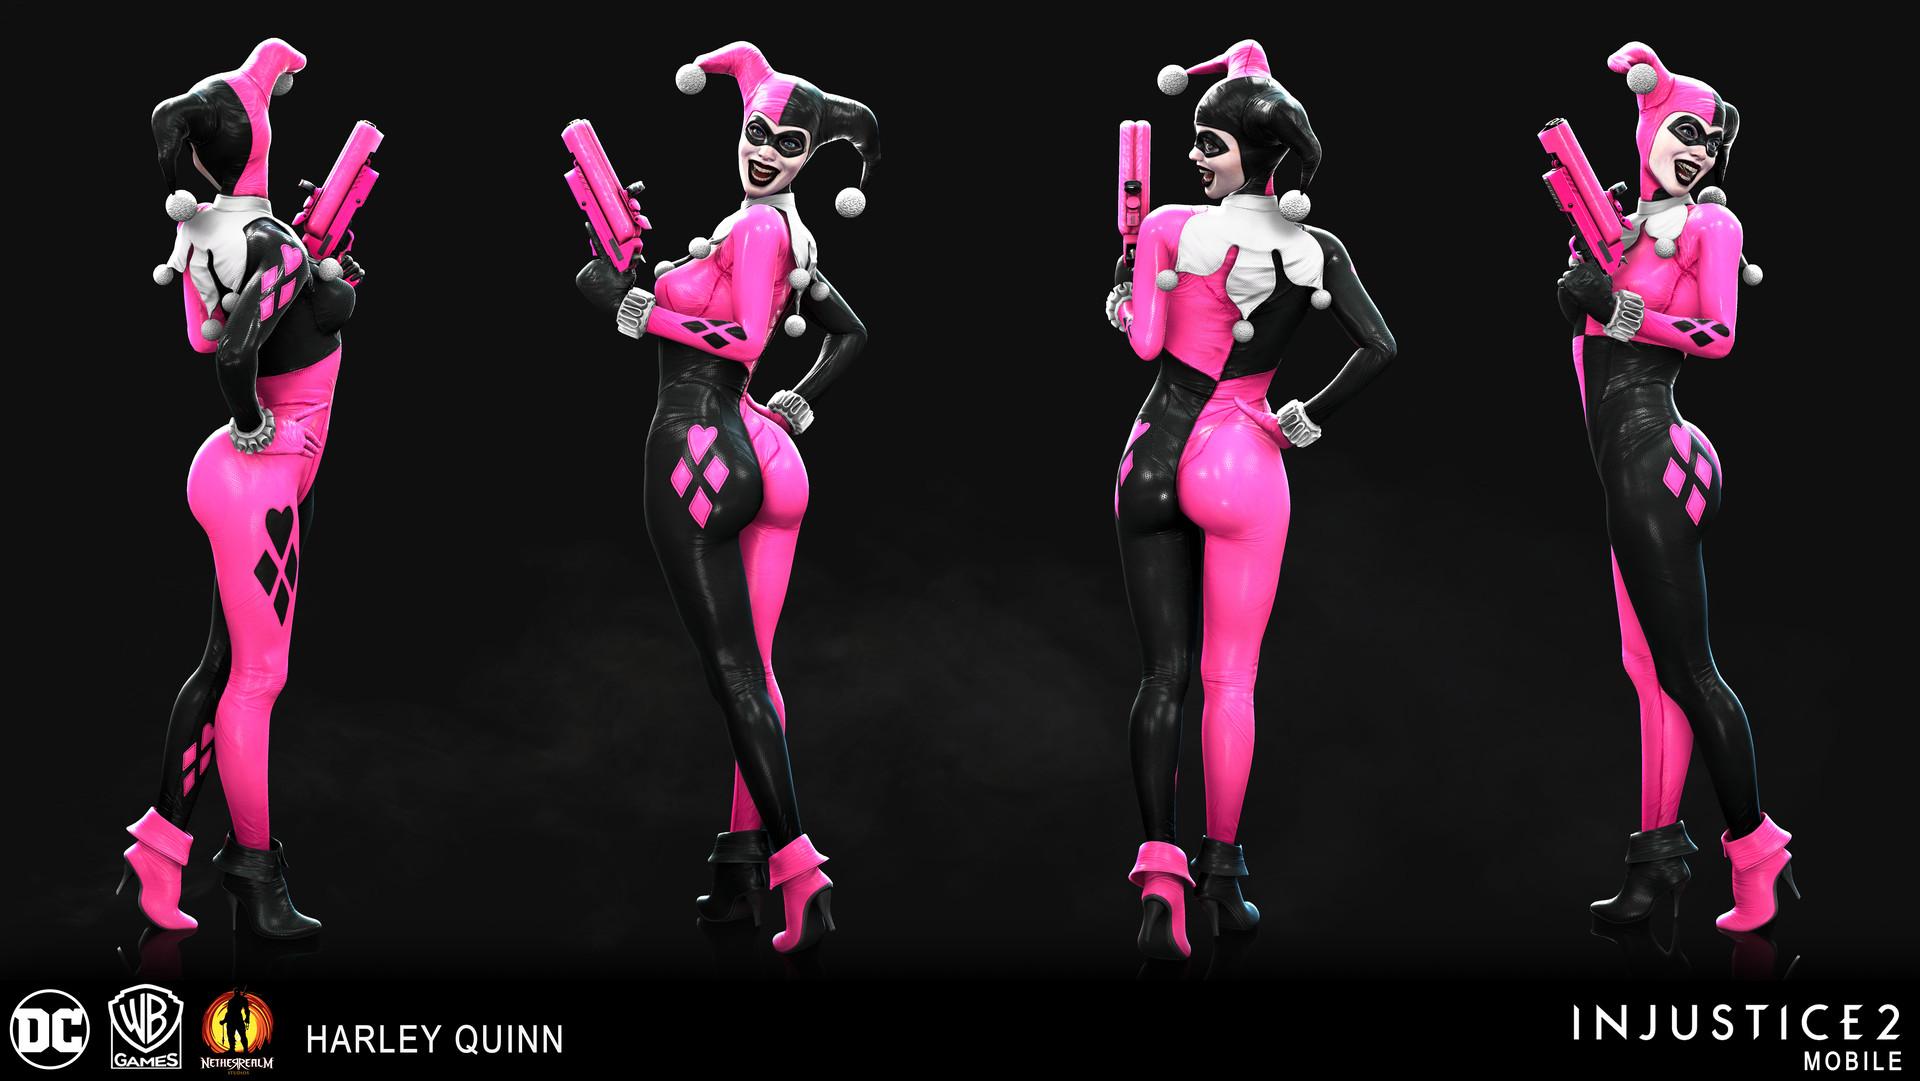 Artstation Injustice 2 Mobile Heartbreaker Harley Quinn Nick Cashio